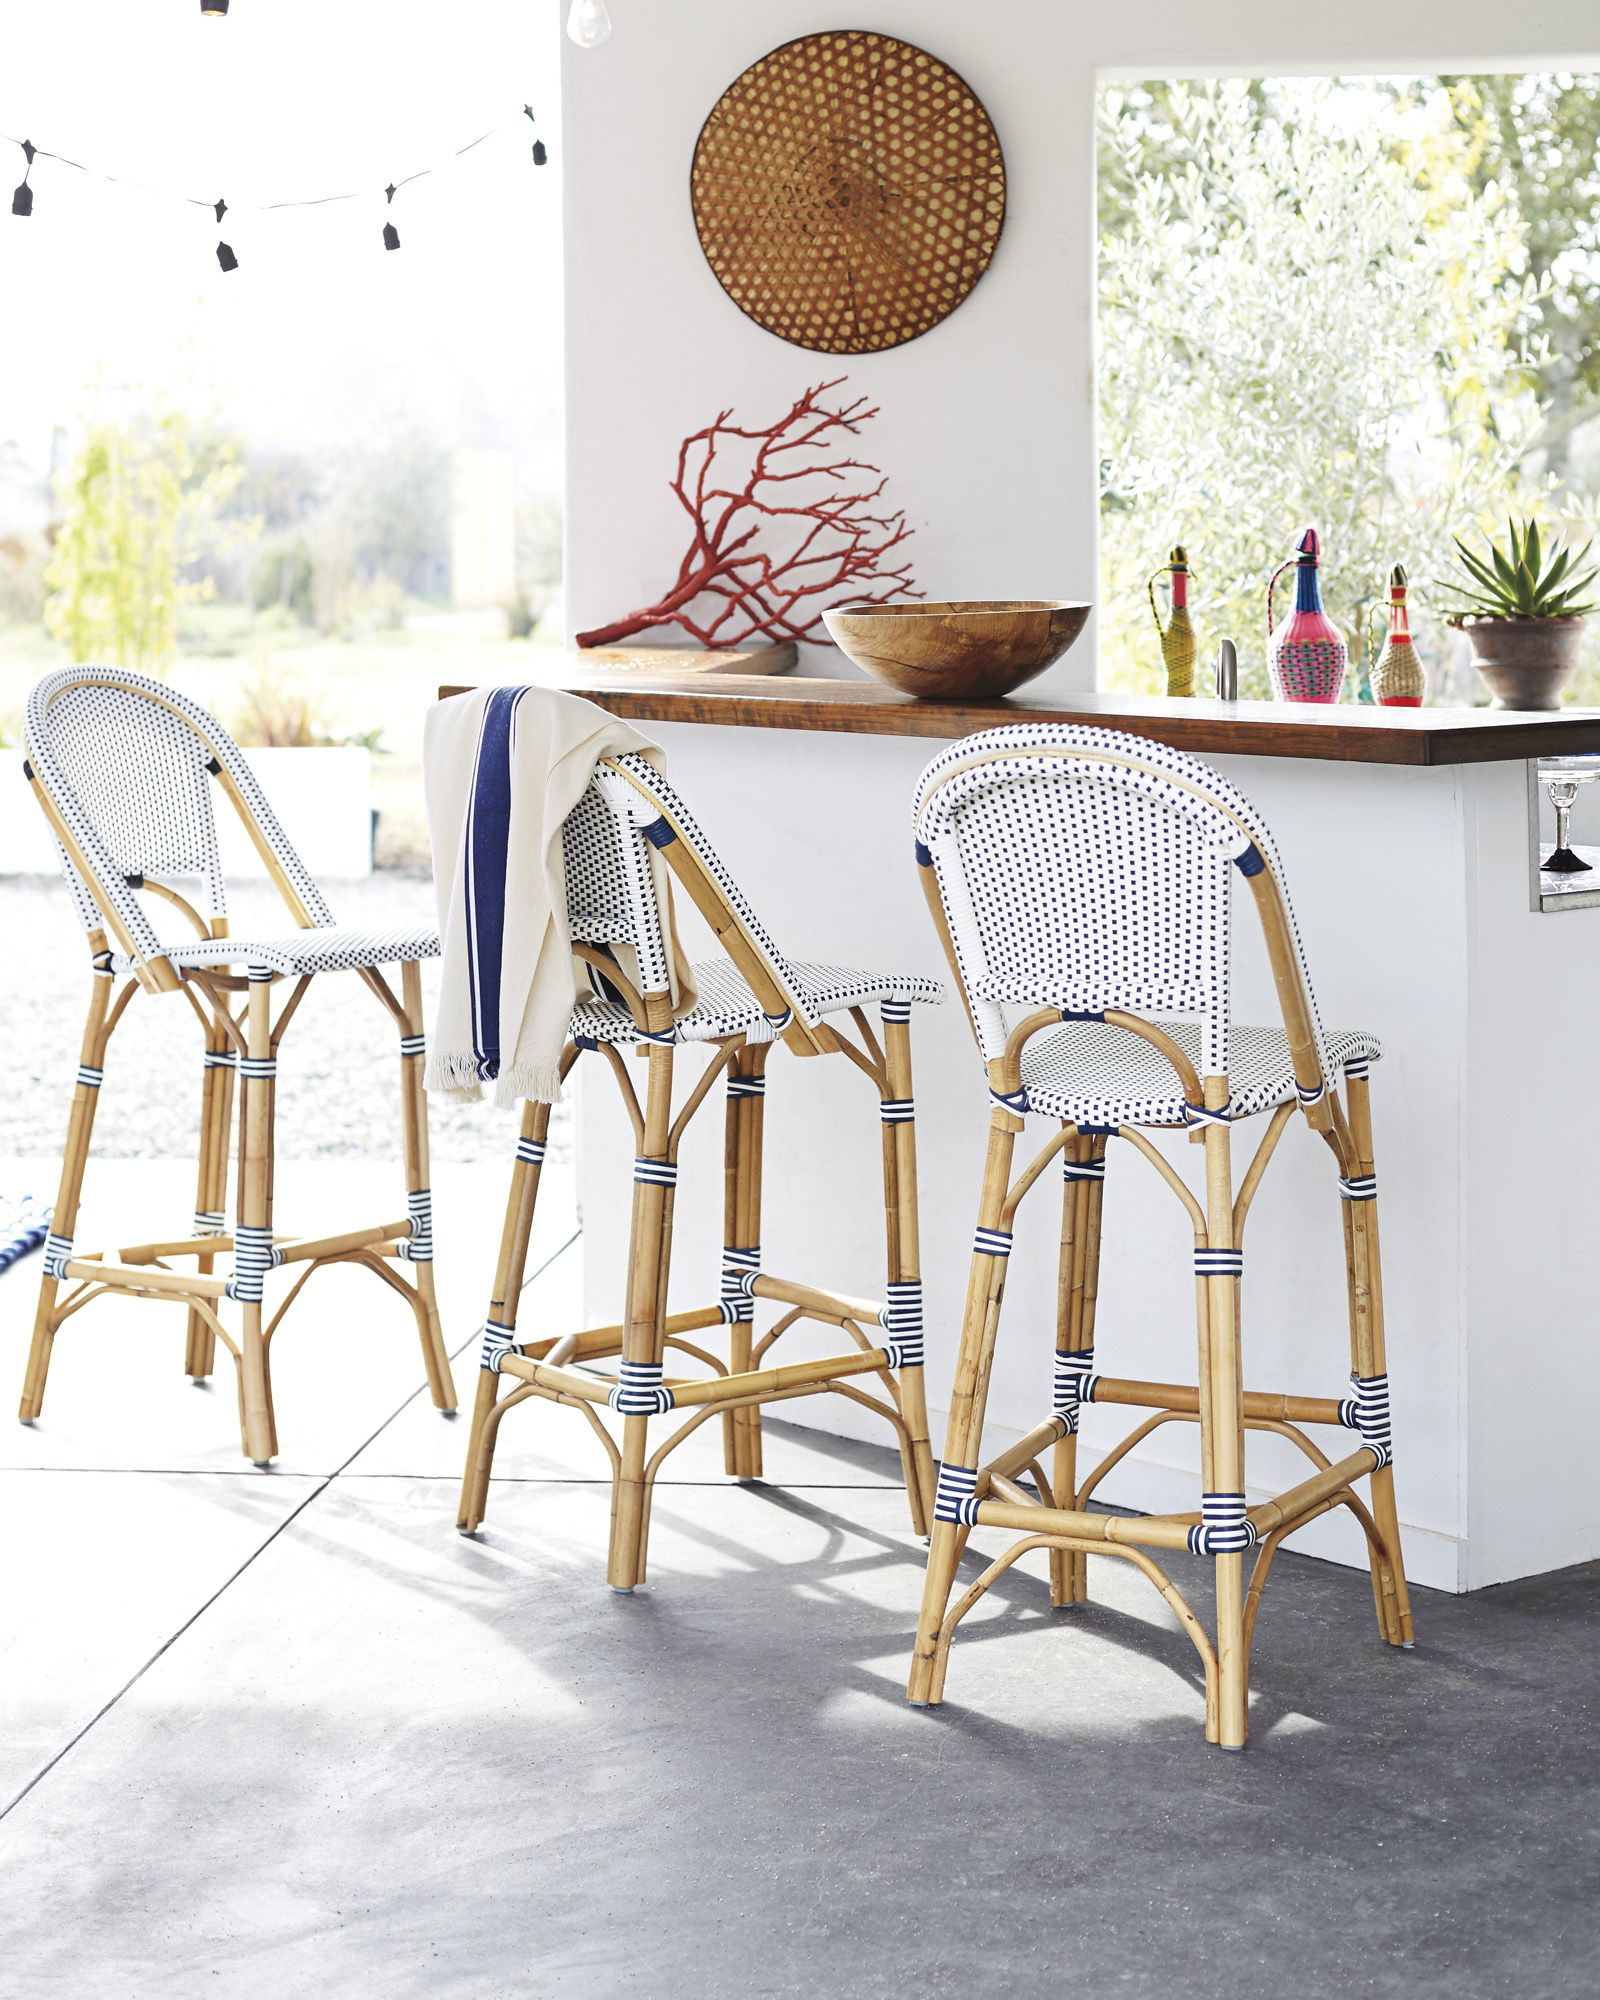 outdoor bar goals riviera stools by serenaandlily dining riviera stools serena lily love for the kitchen island